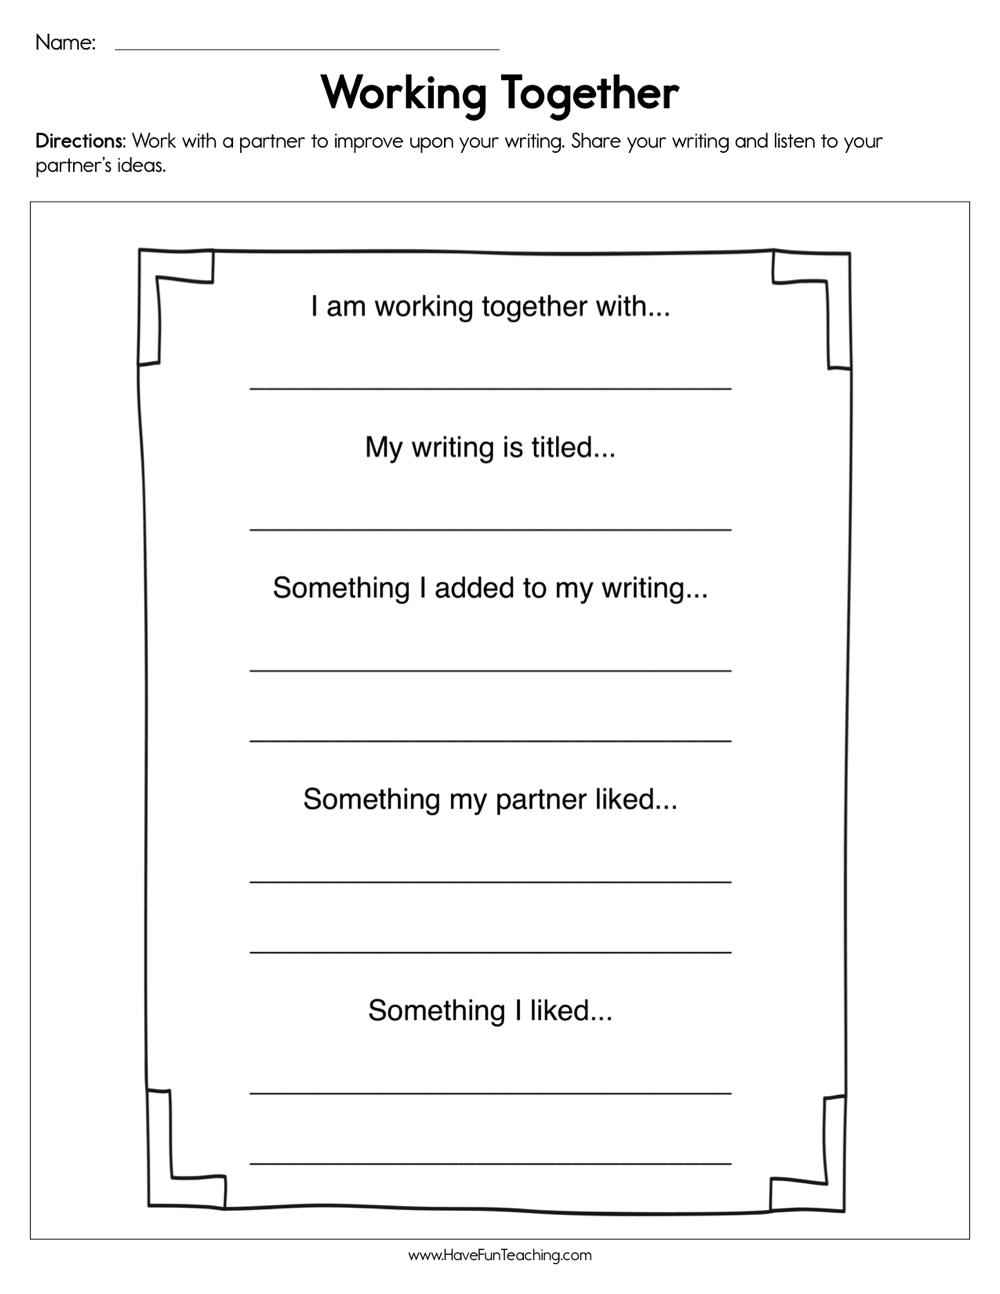 medium resolution of Working Together Worksheet • Have Fun Teaching